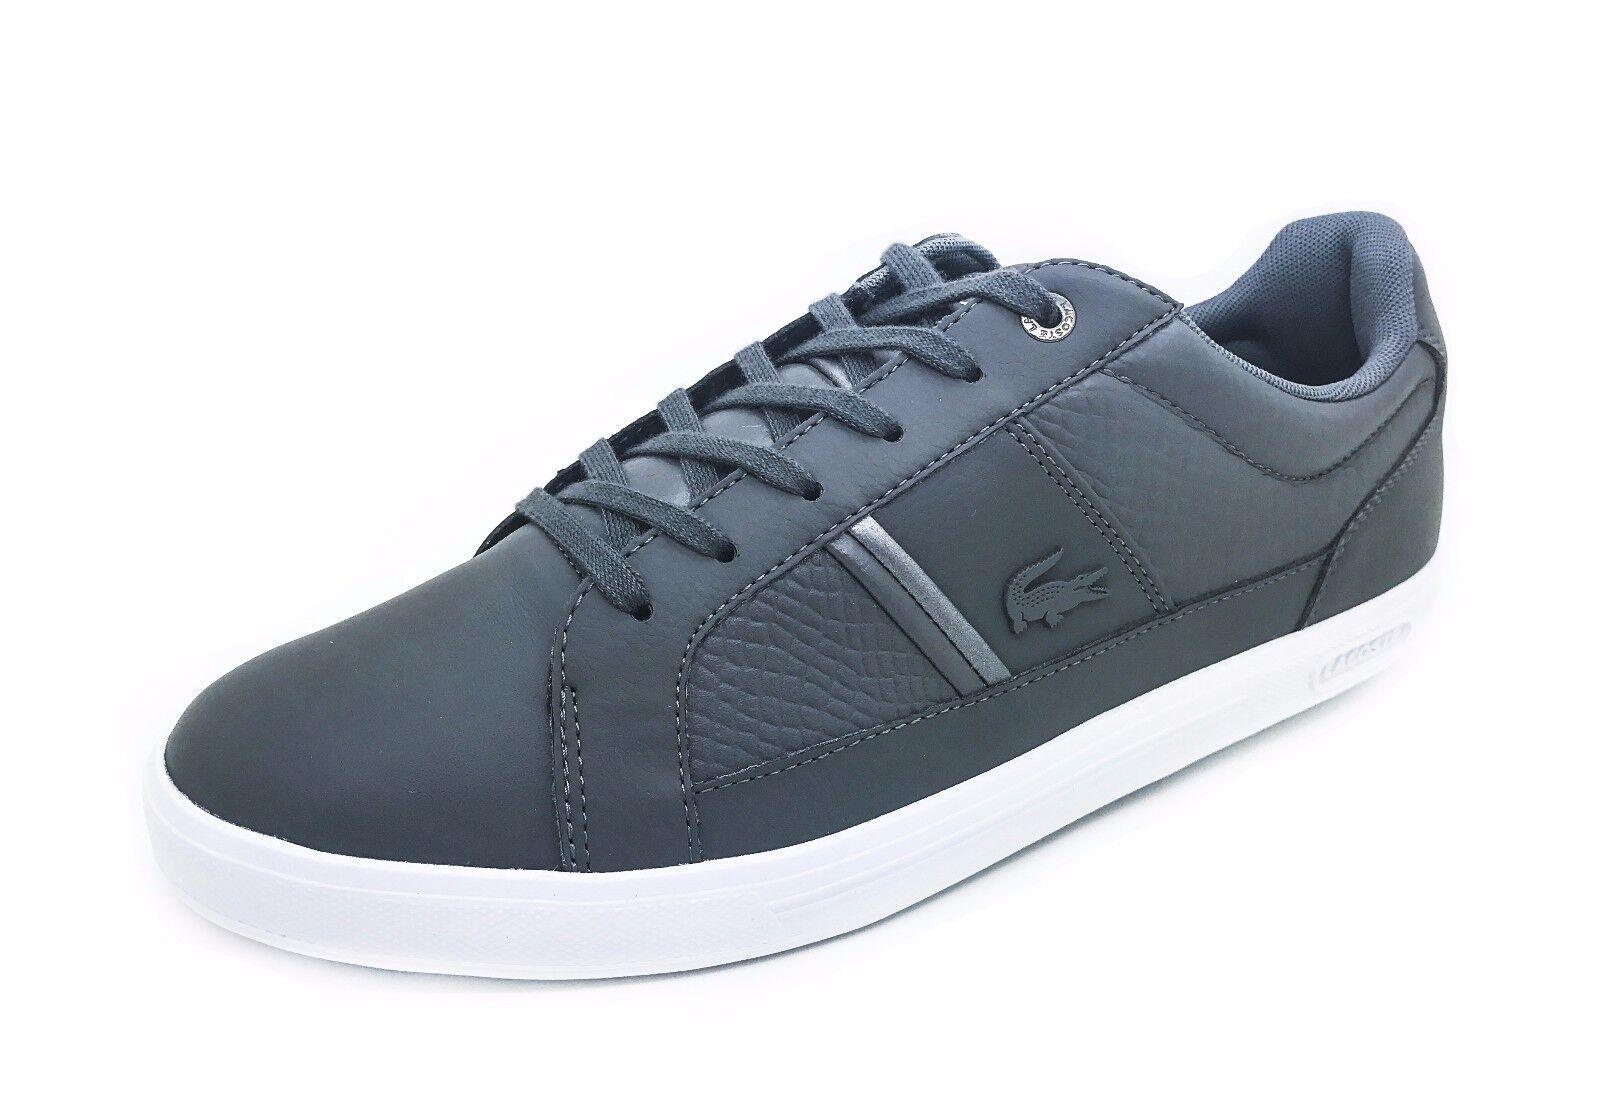 New Lacoste Men's Fashion Europa 417 Grey Sneaker shoes